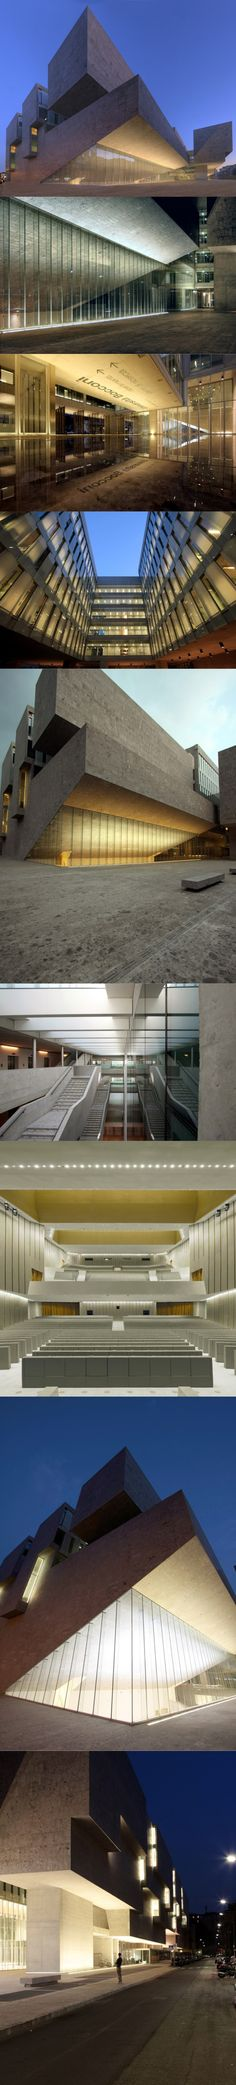 2008 Grafton - Bocconi University / Milan - Italy / Ireland